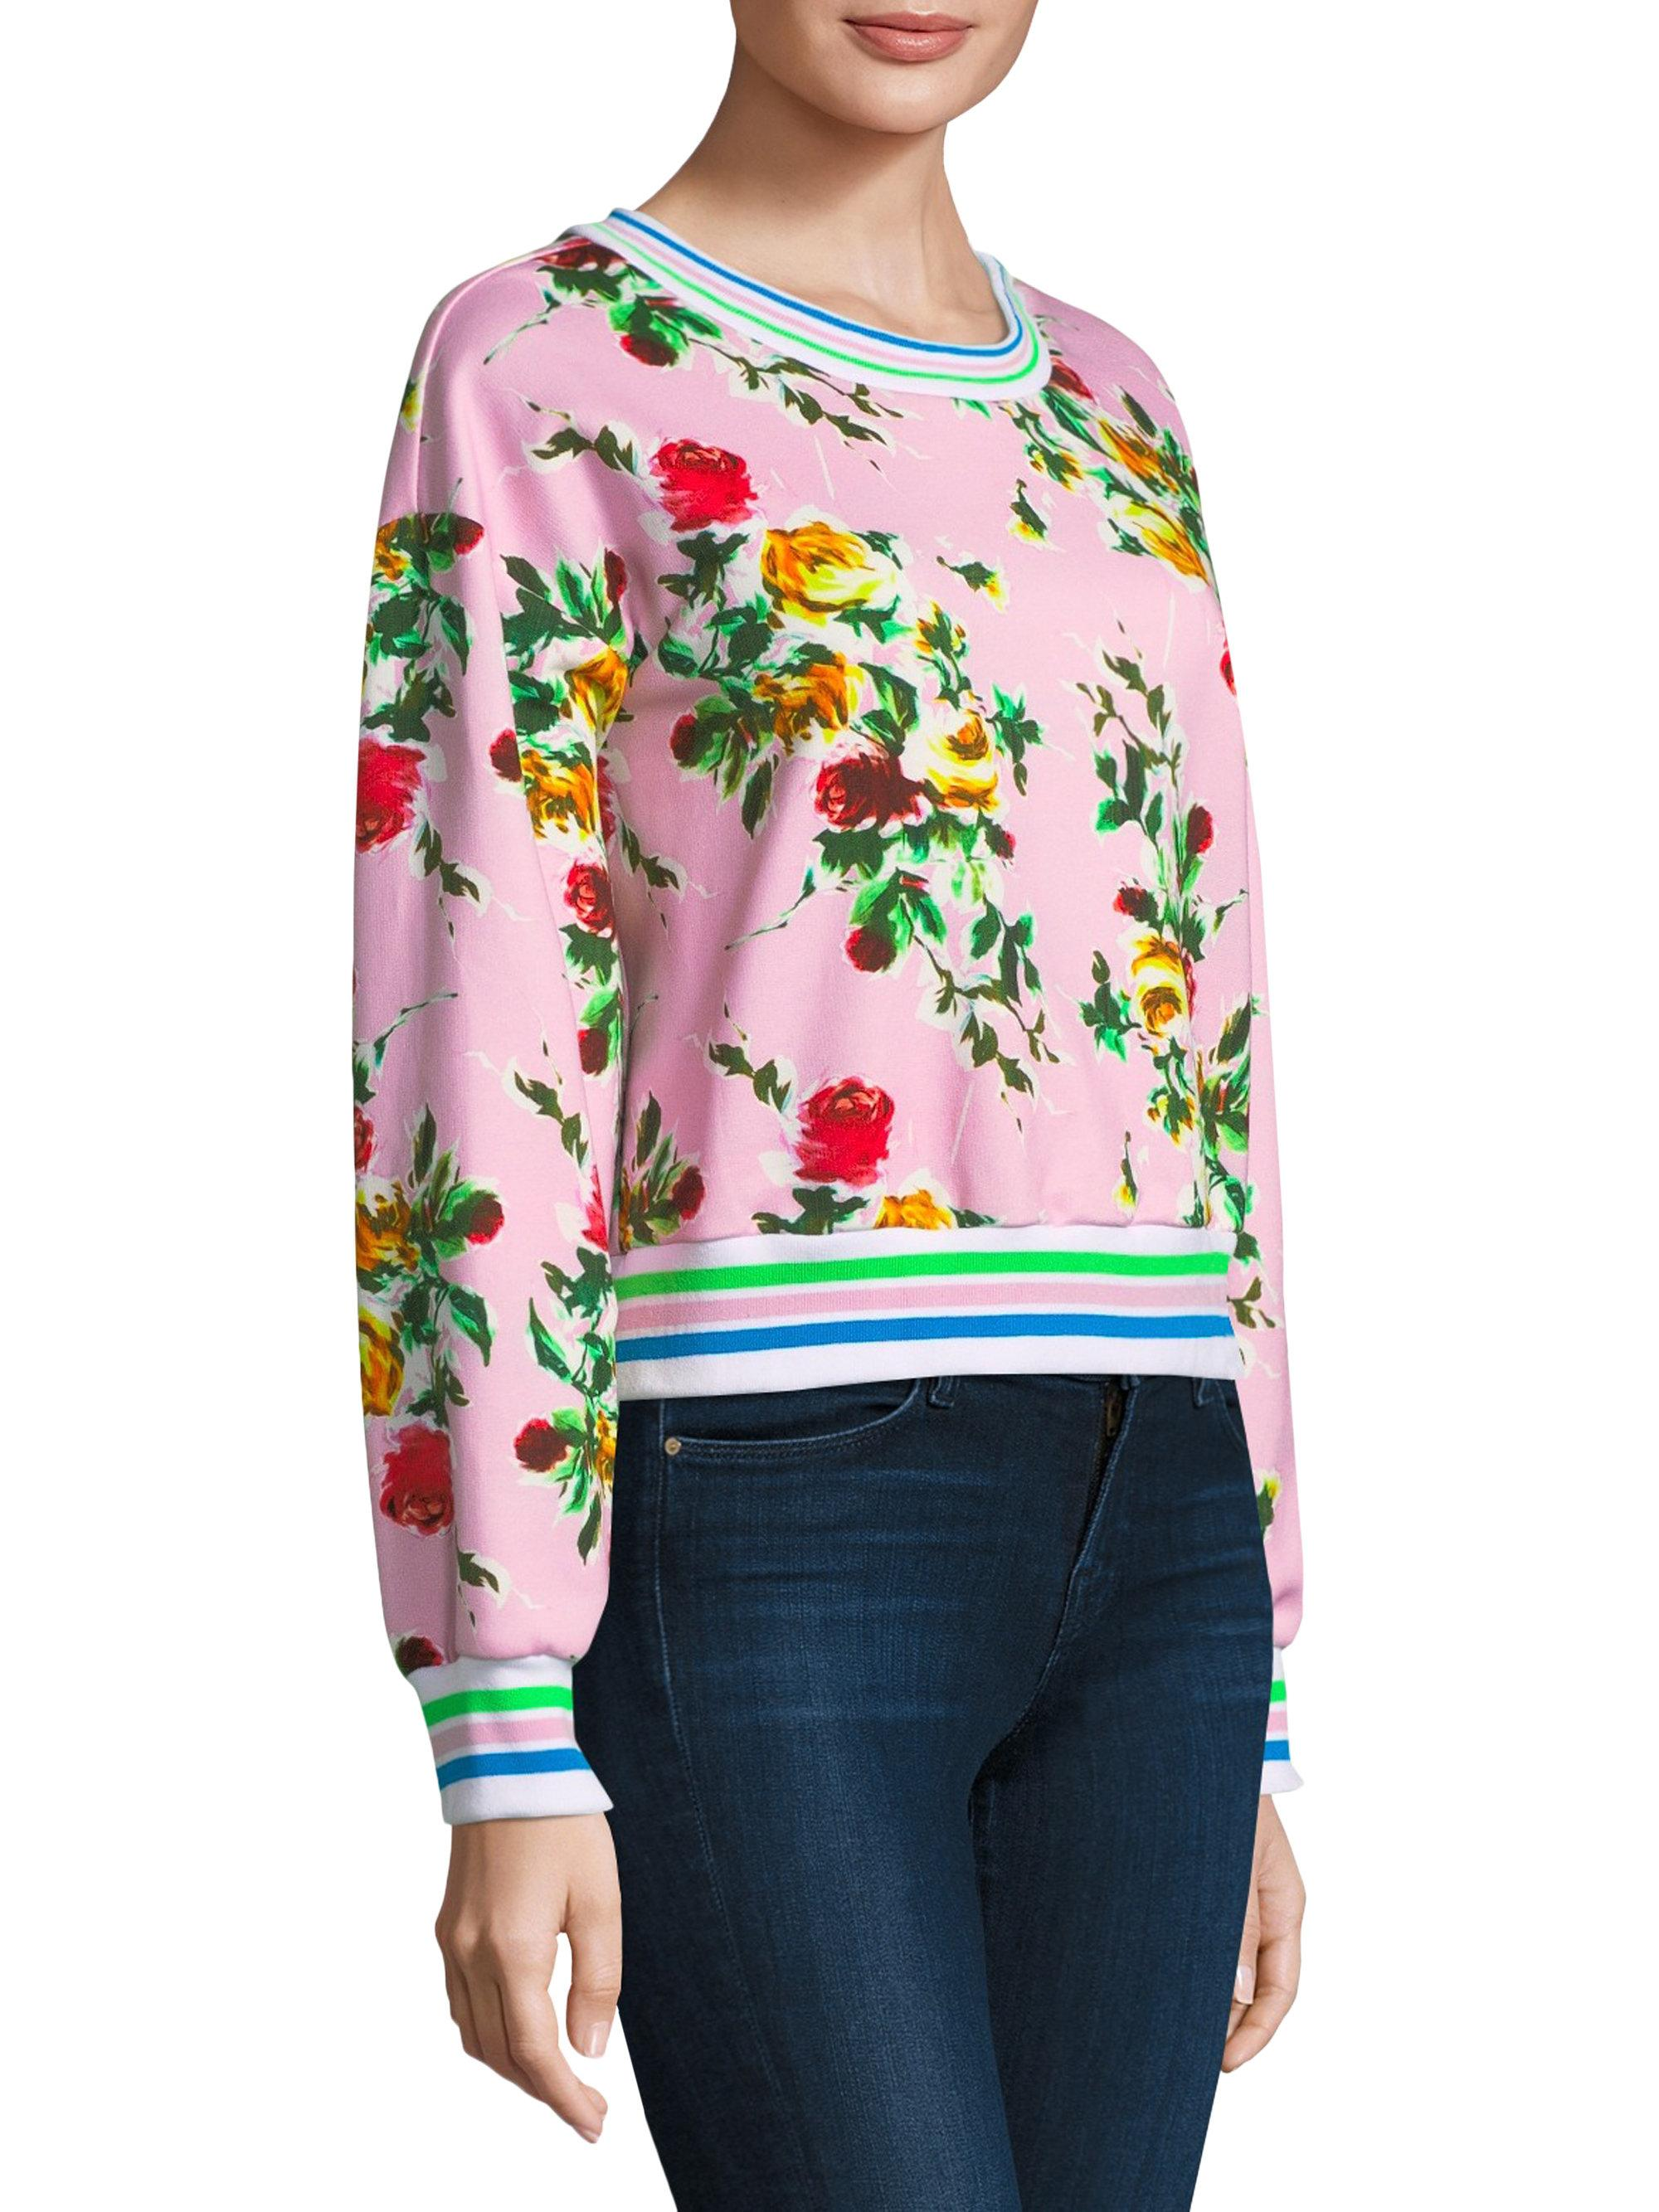 c5aa726479f8 Lyst - MILLY Tyler Floral Sweatshirt